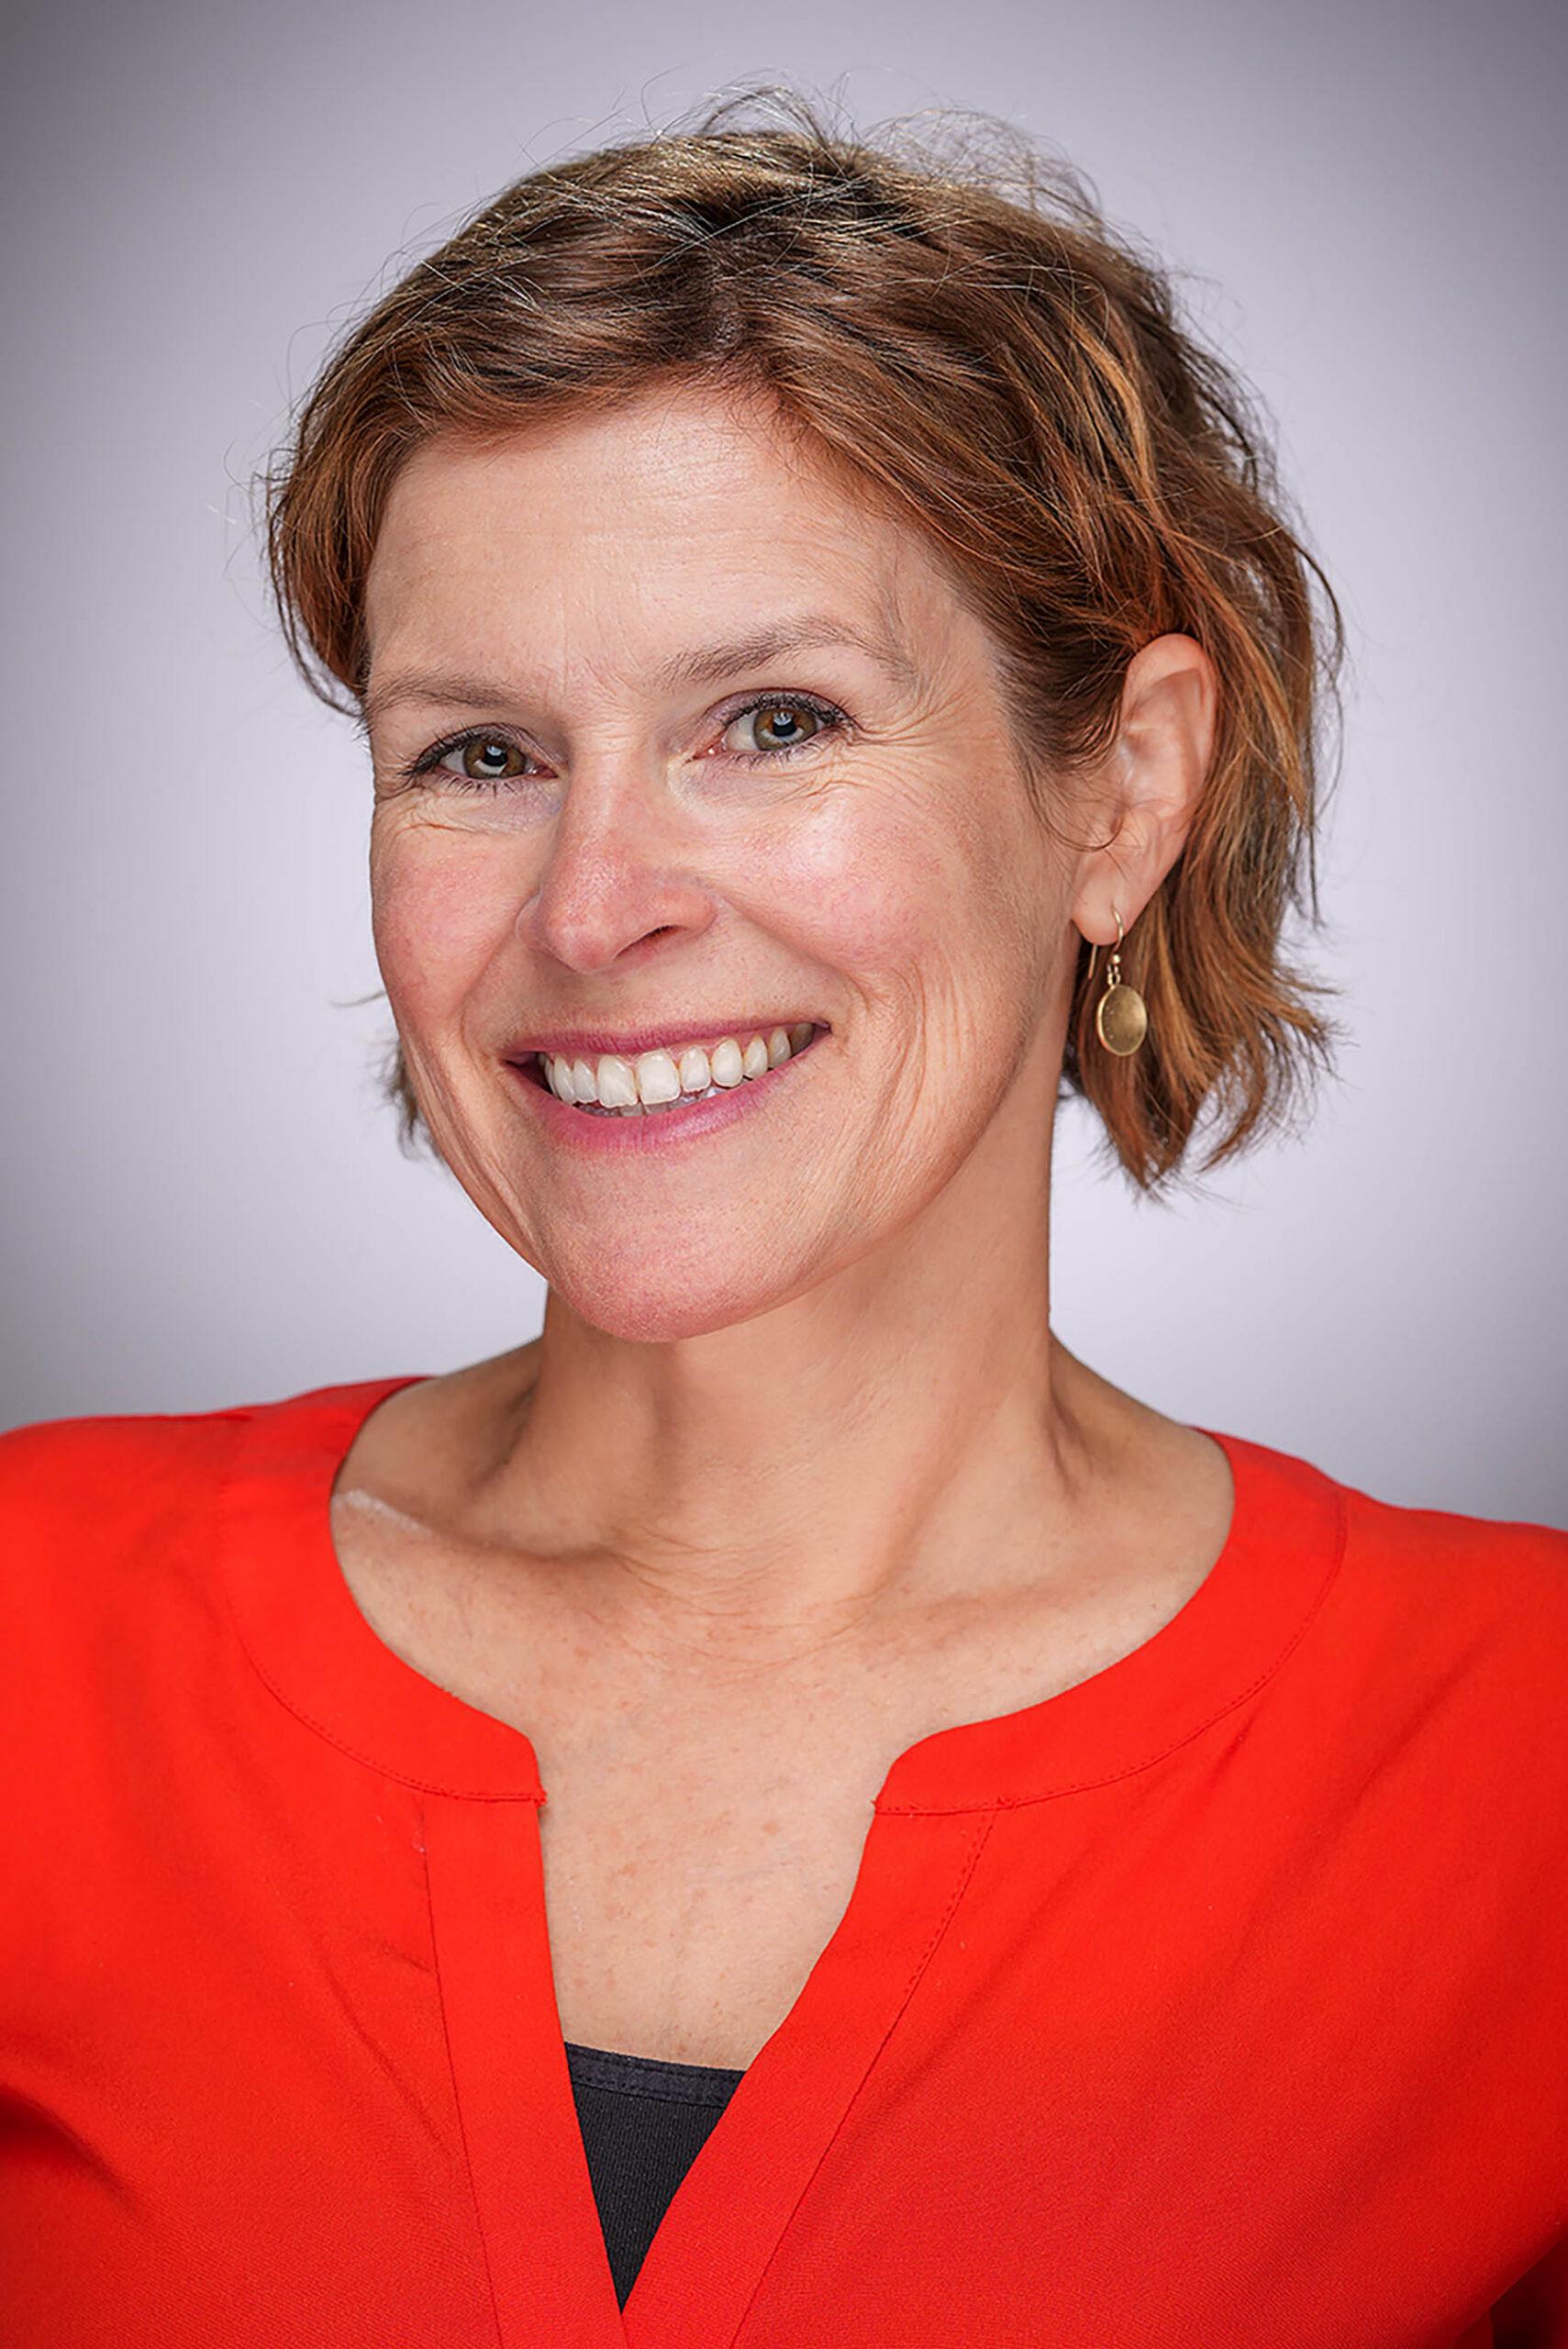 Cynthia Brame, CFT Associate Director